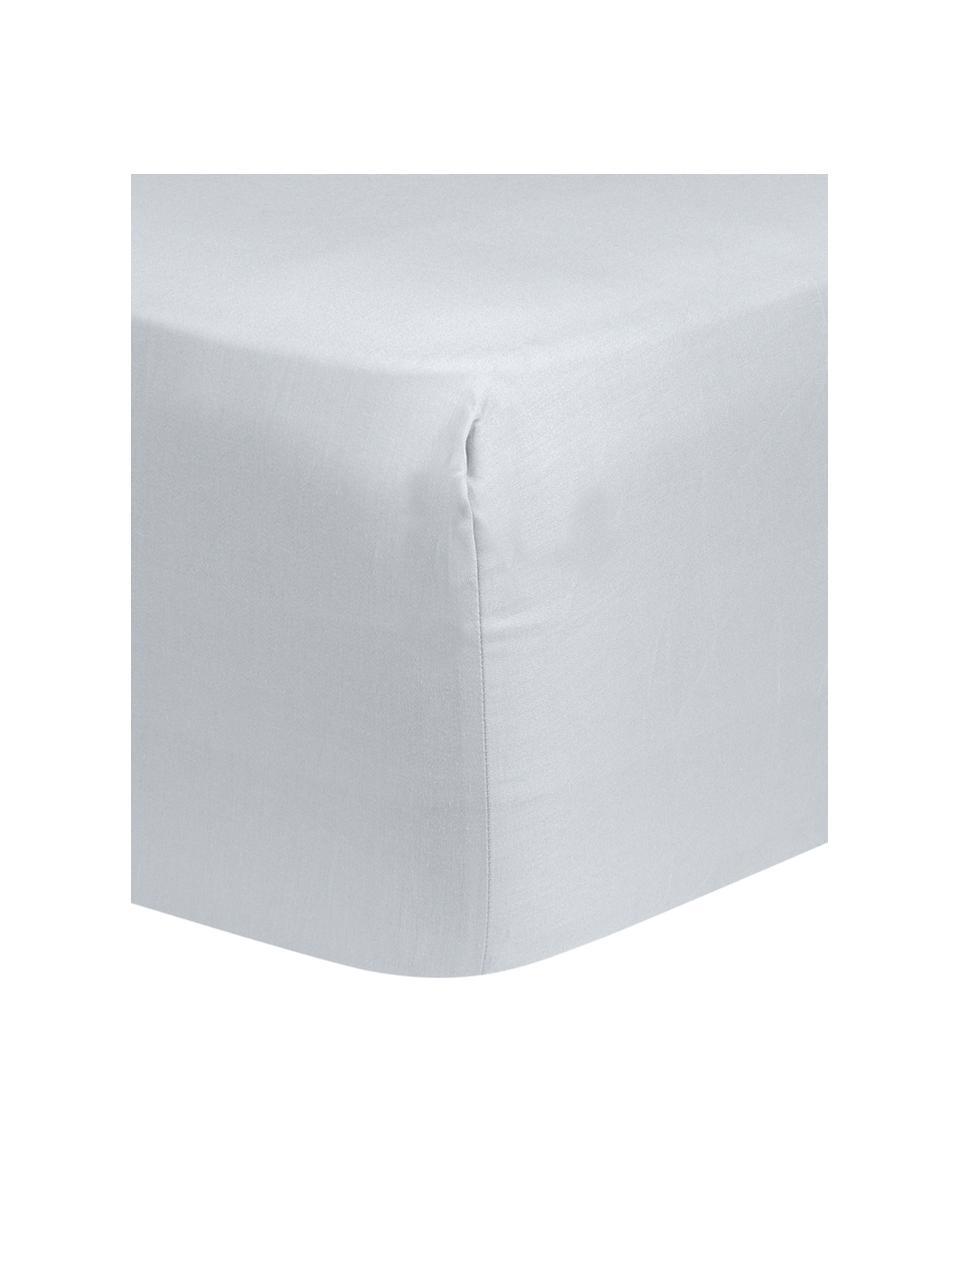 Sábana bajera de satén Comfort, Gris claro, Cama 180 cm (180 x 200 cm)